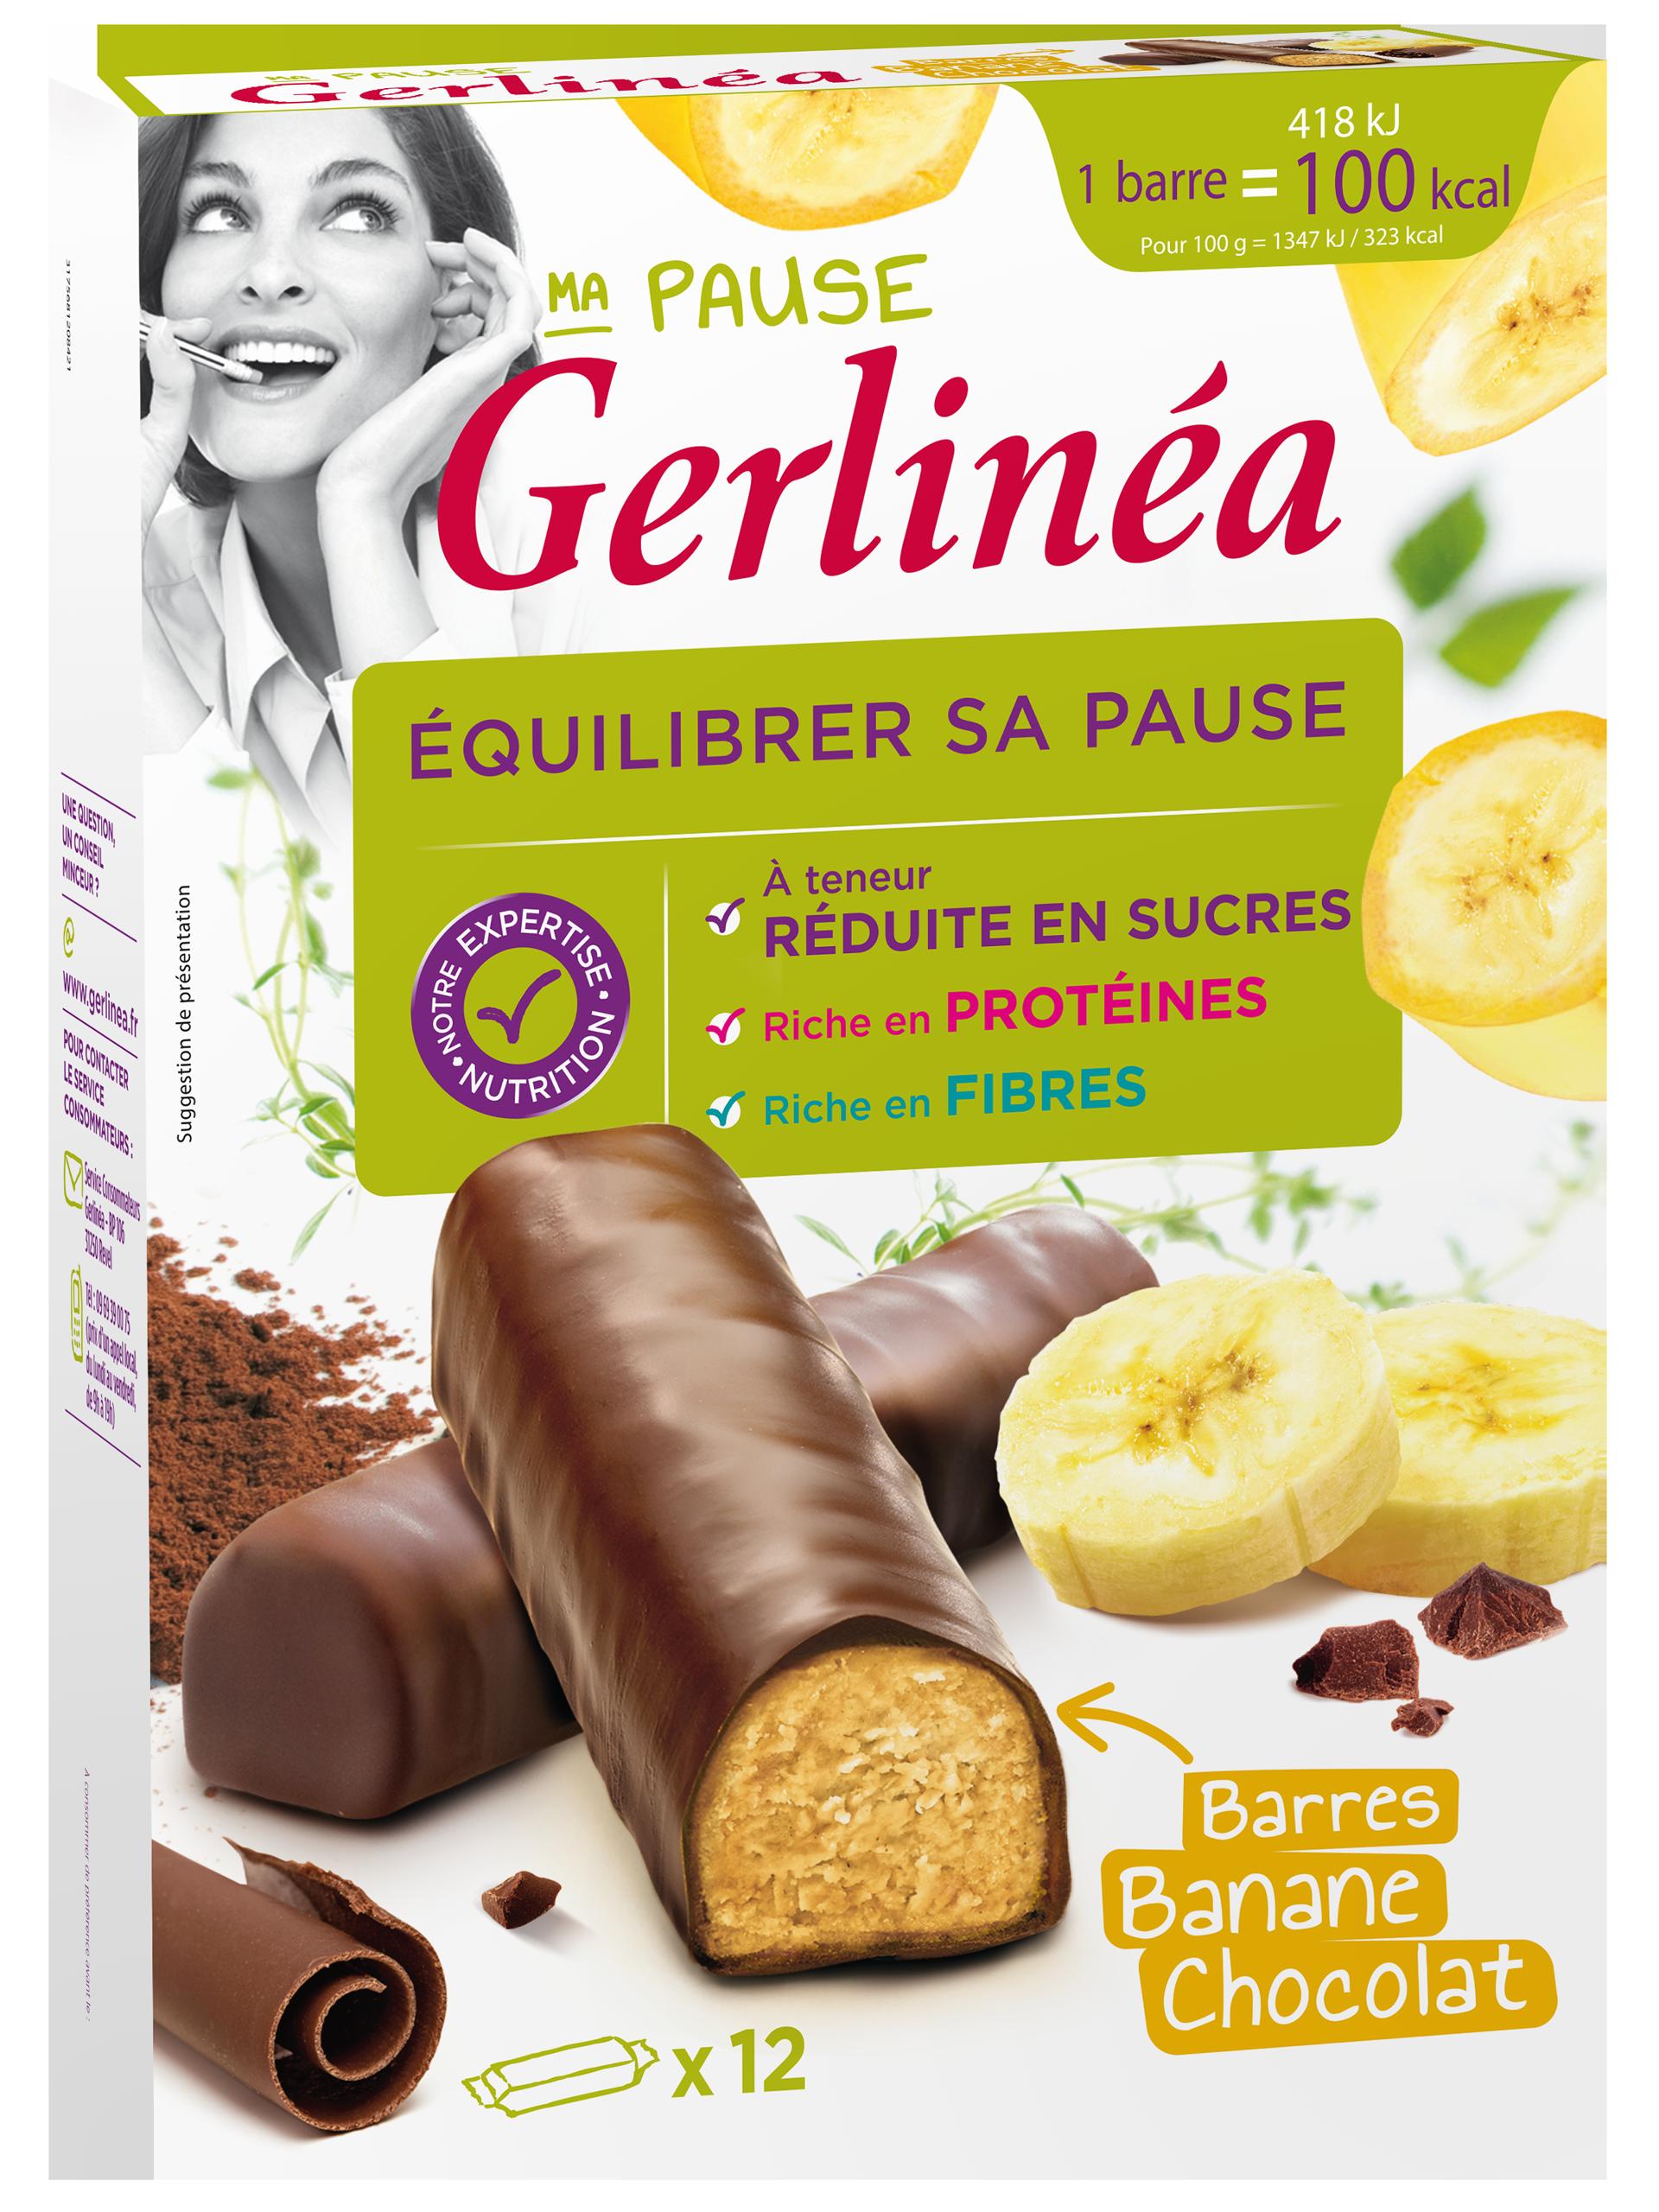 Gerlinea-Batoane-Banane-Ciocolata